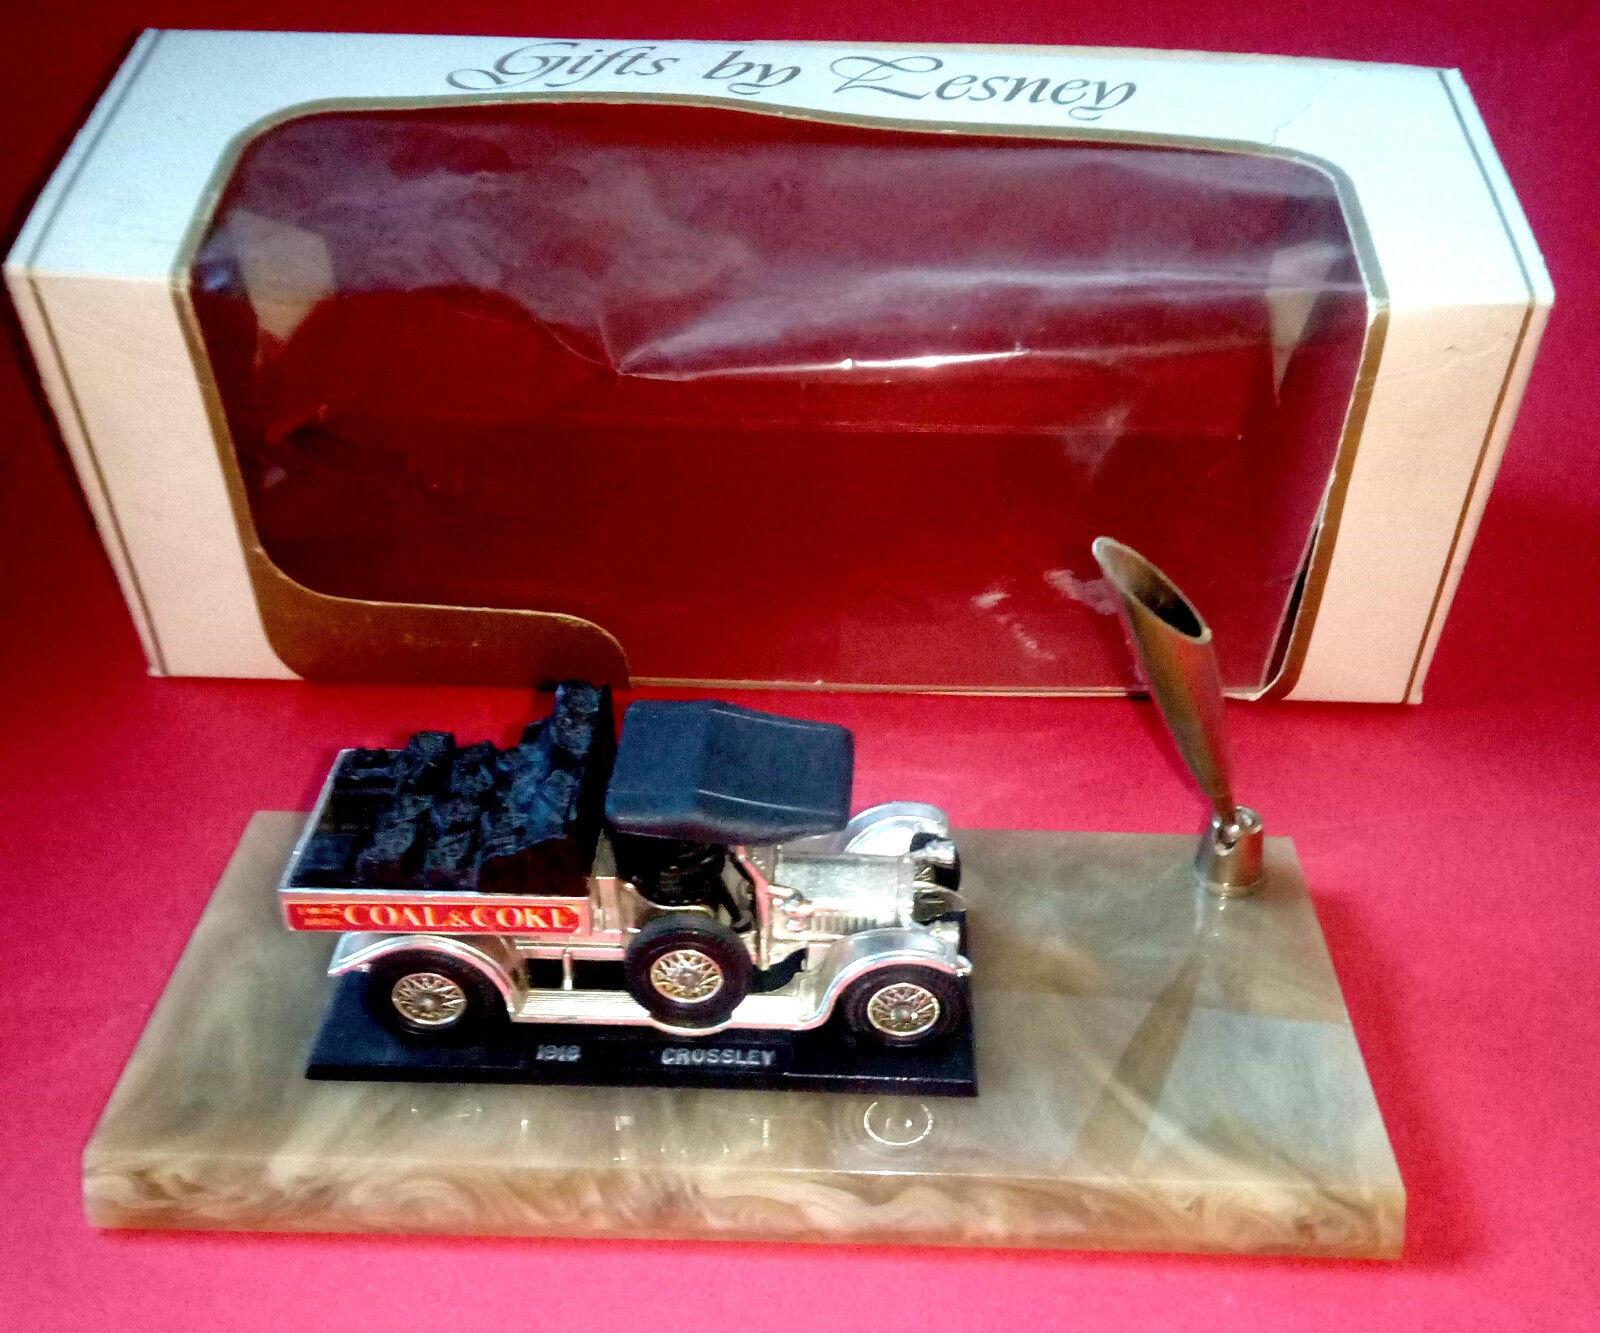 Matchbox Yesteryear MOY Y-13 Crosssley 1918 Single Pen Holder Coal Coal Coal & Coke OVP eadb79